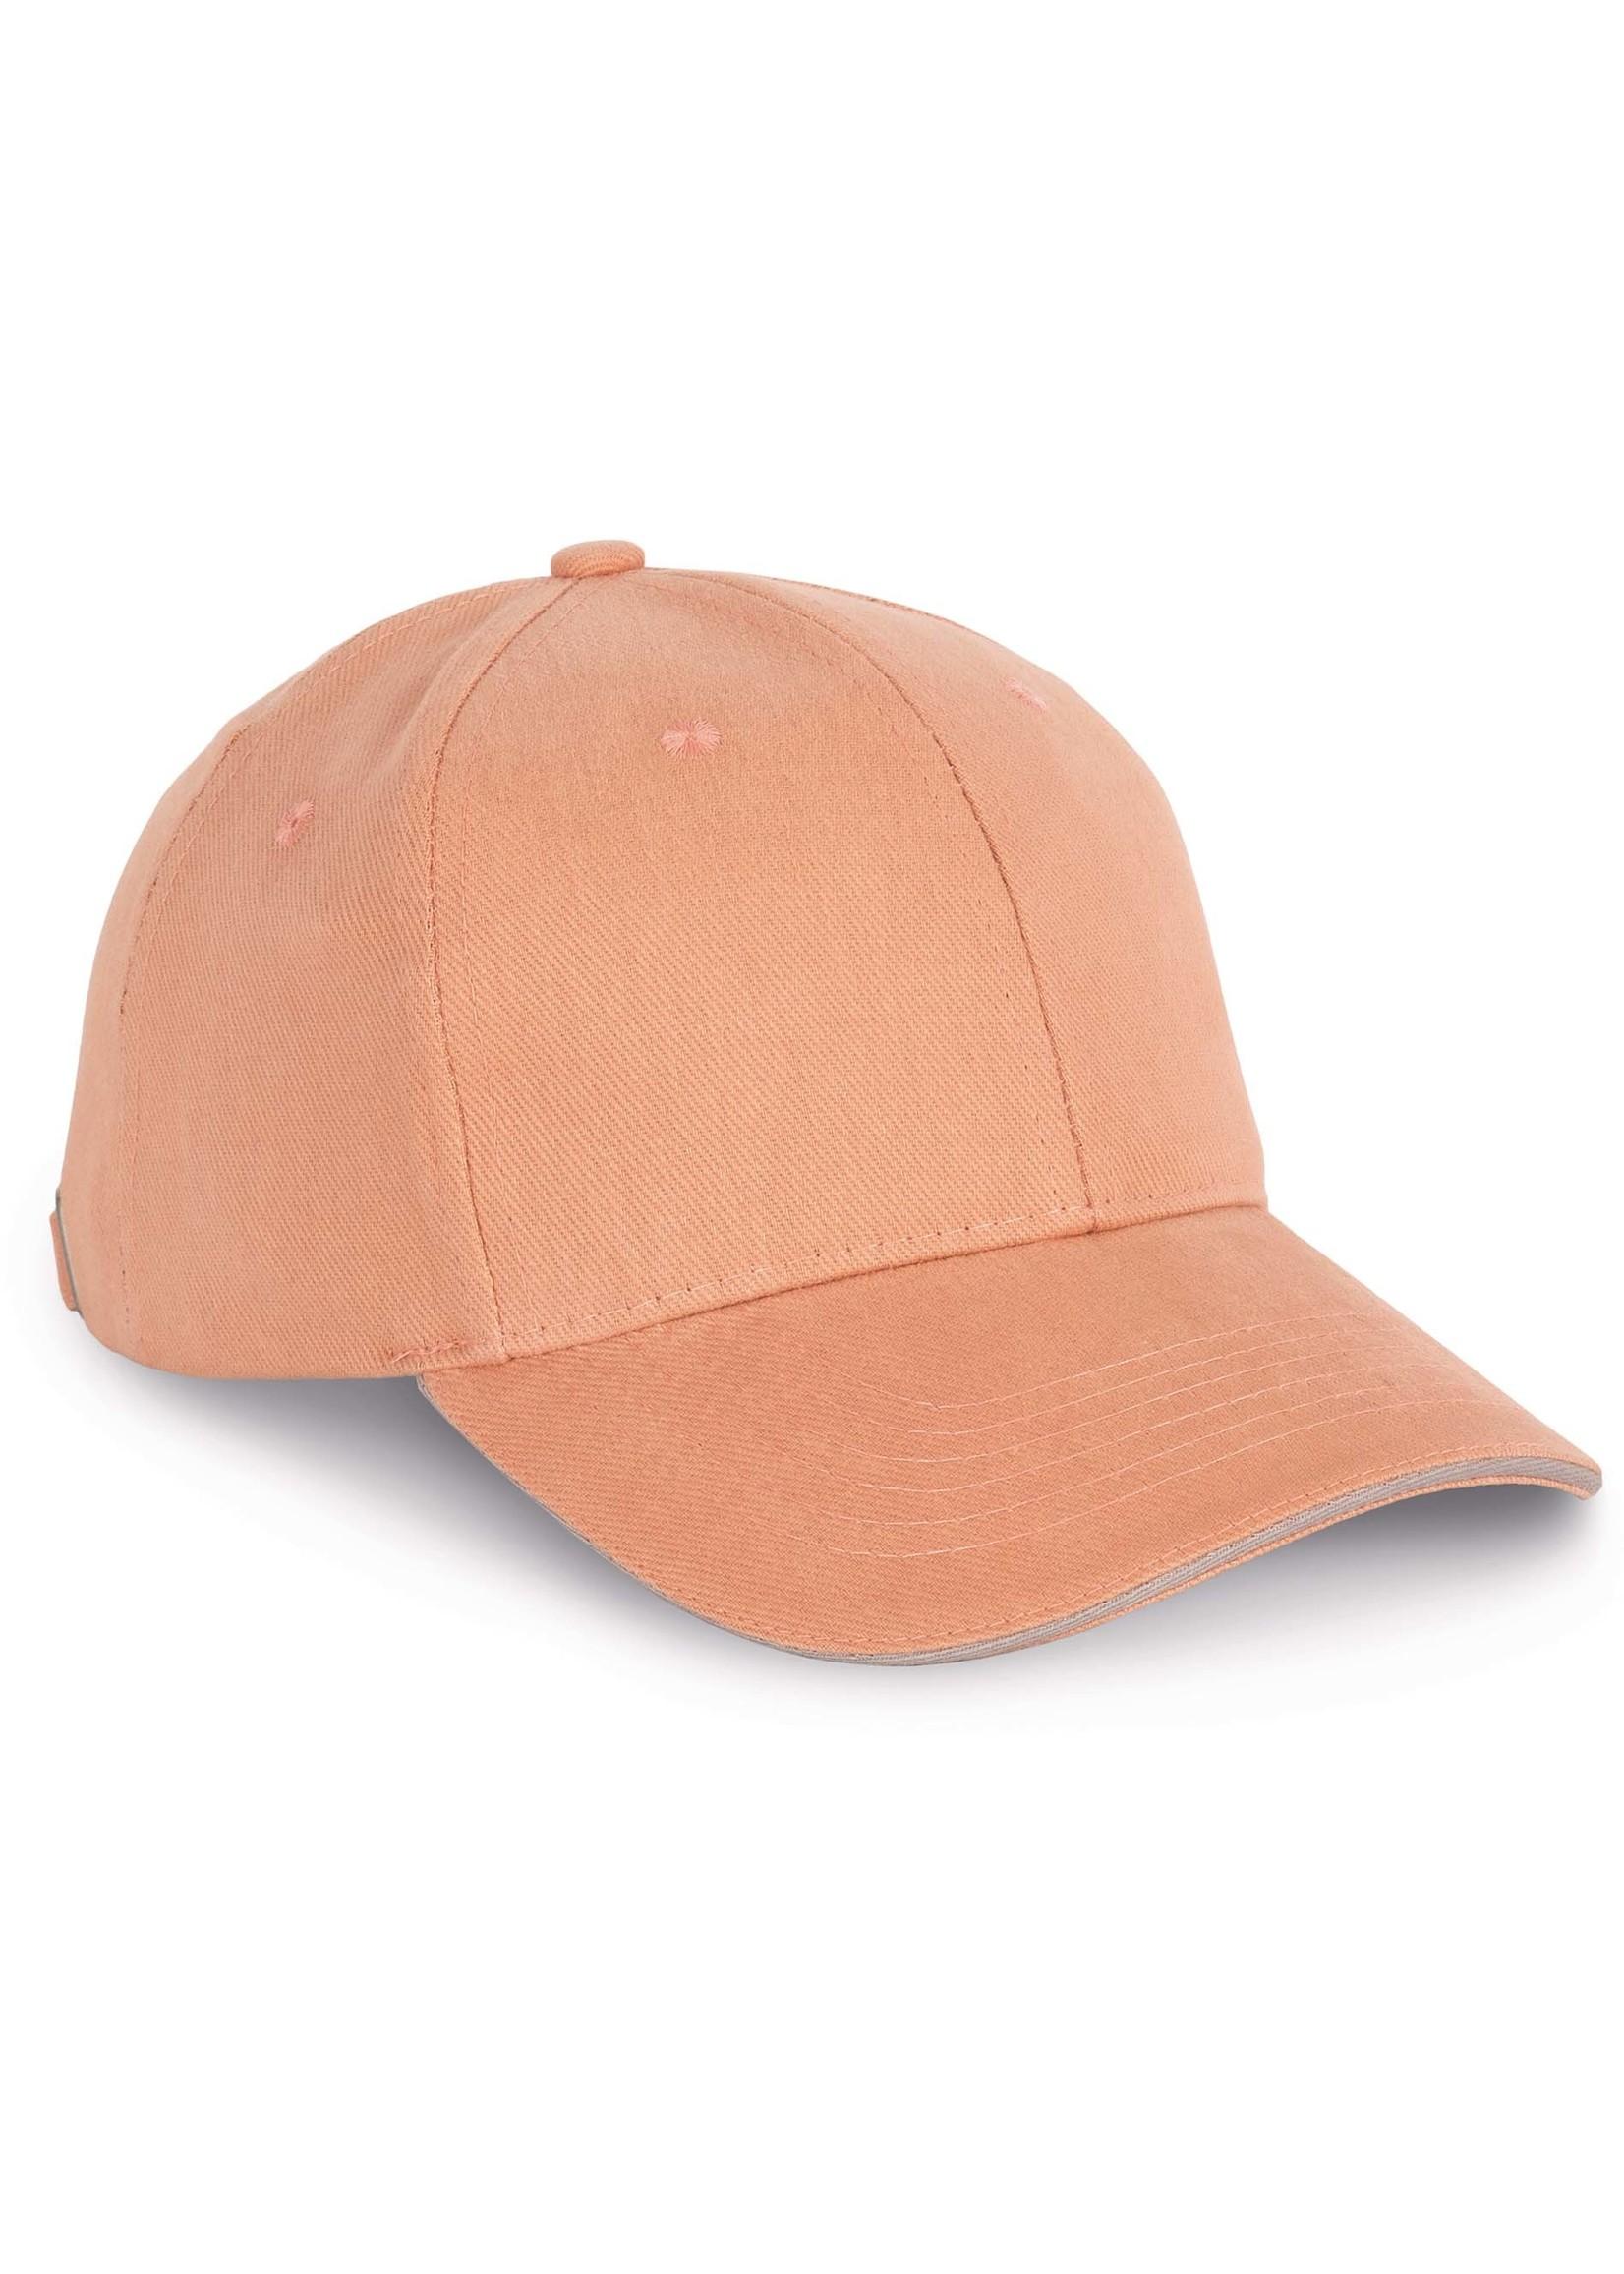 Cap van 100% Biokatoen kleur Irongrey-Pineapple